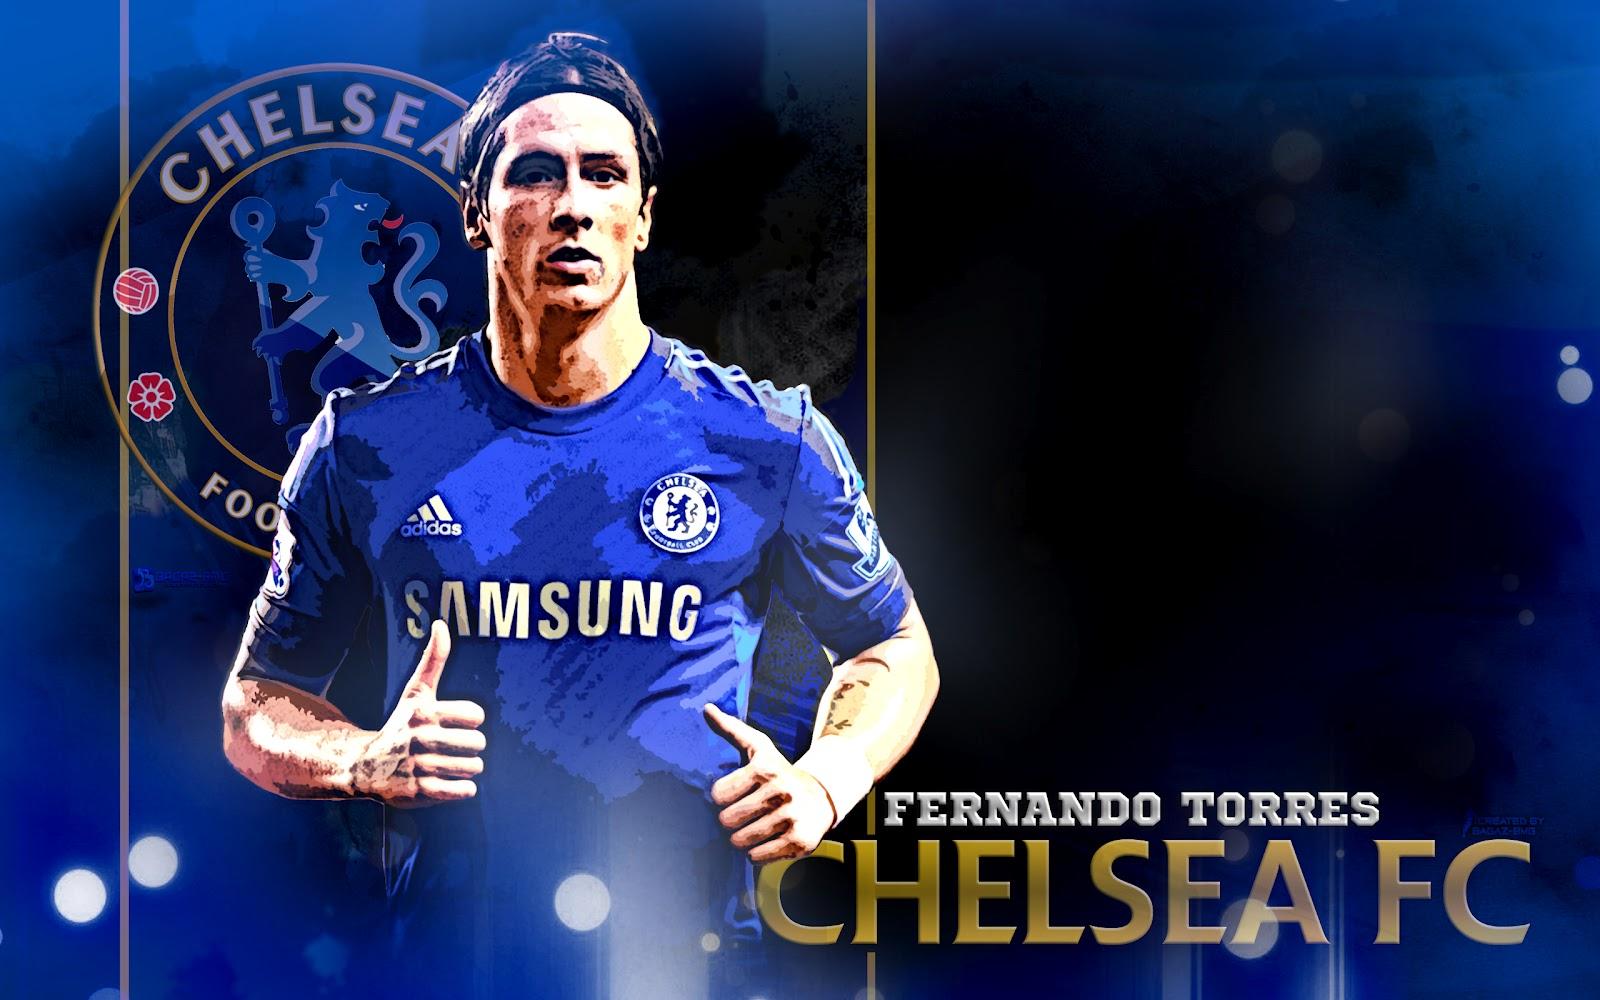 Fernando Torres 2013 Wallpapers HD 1600x1000